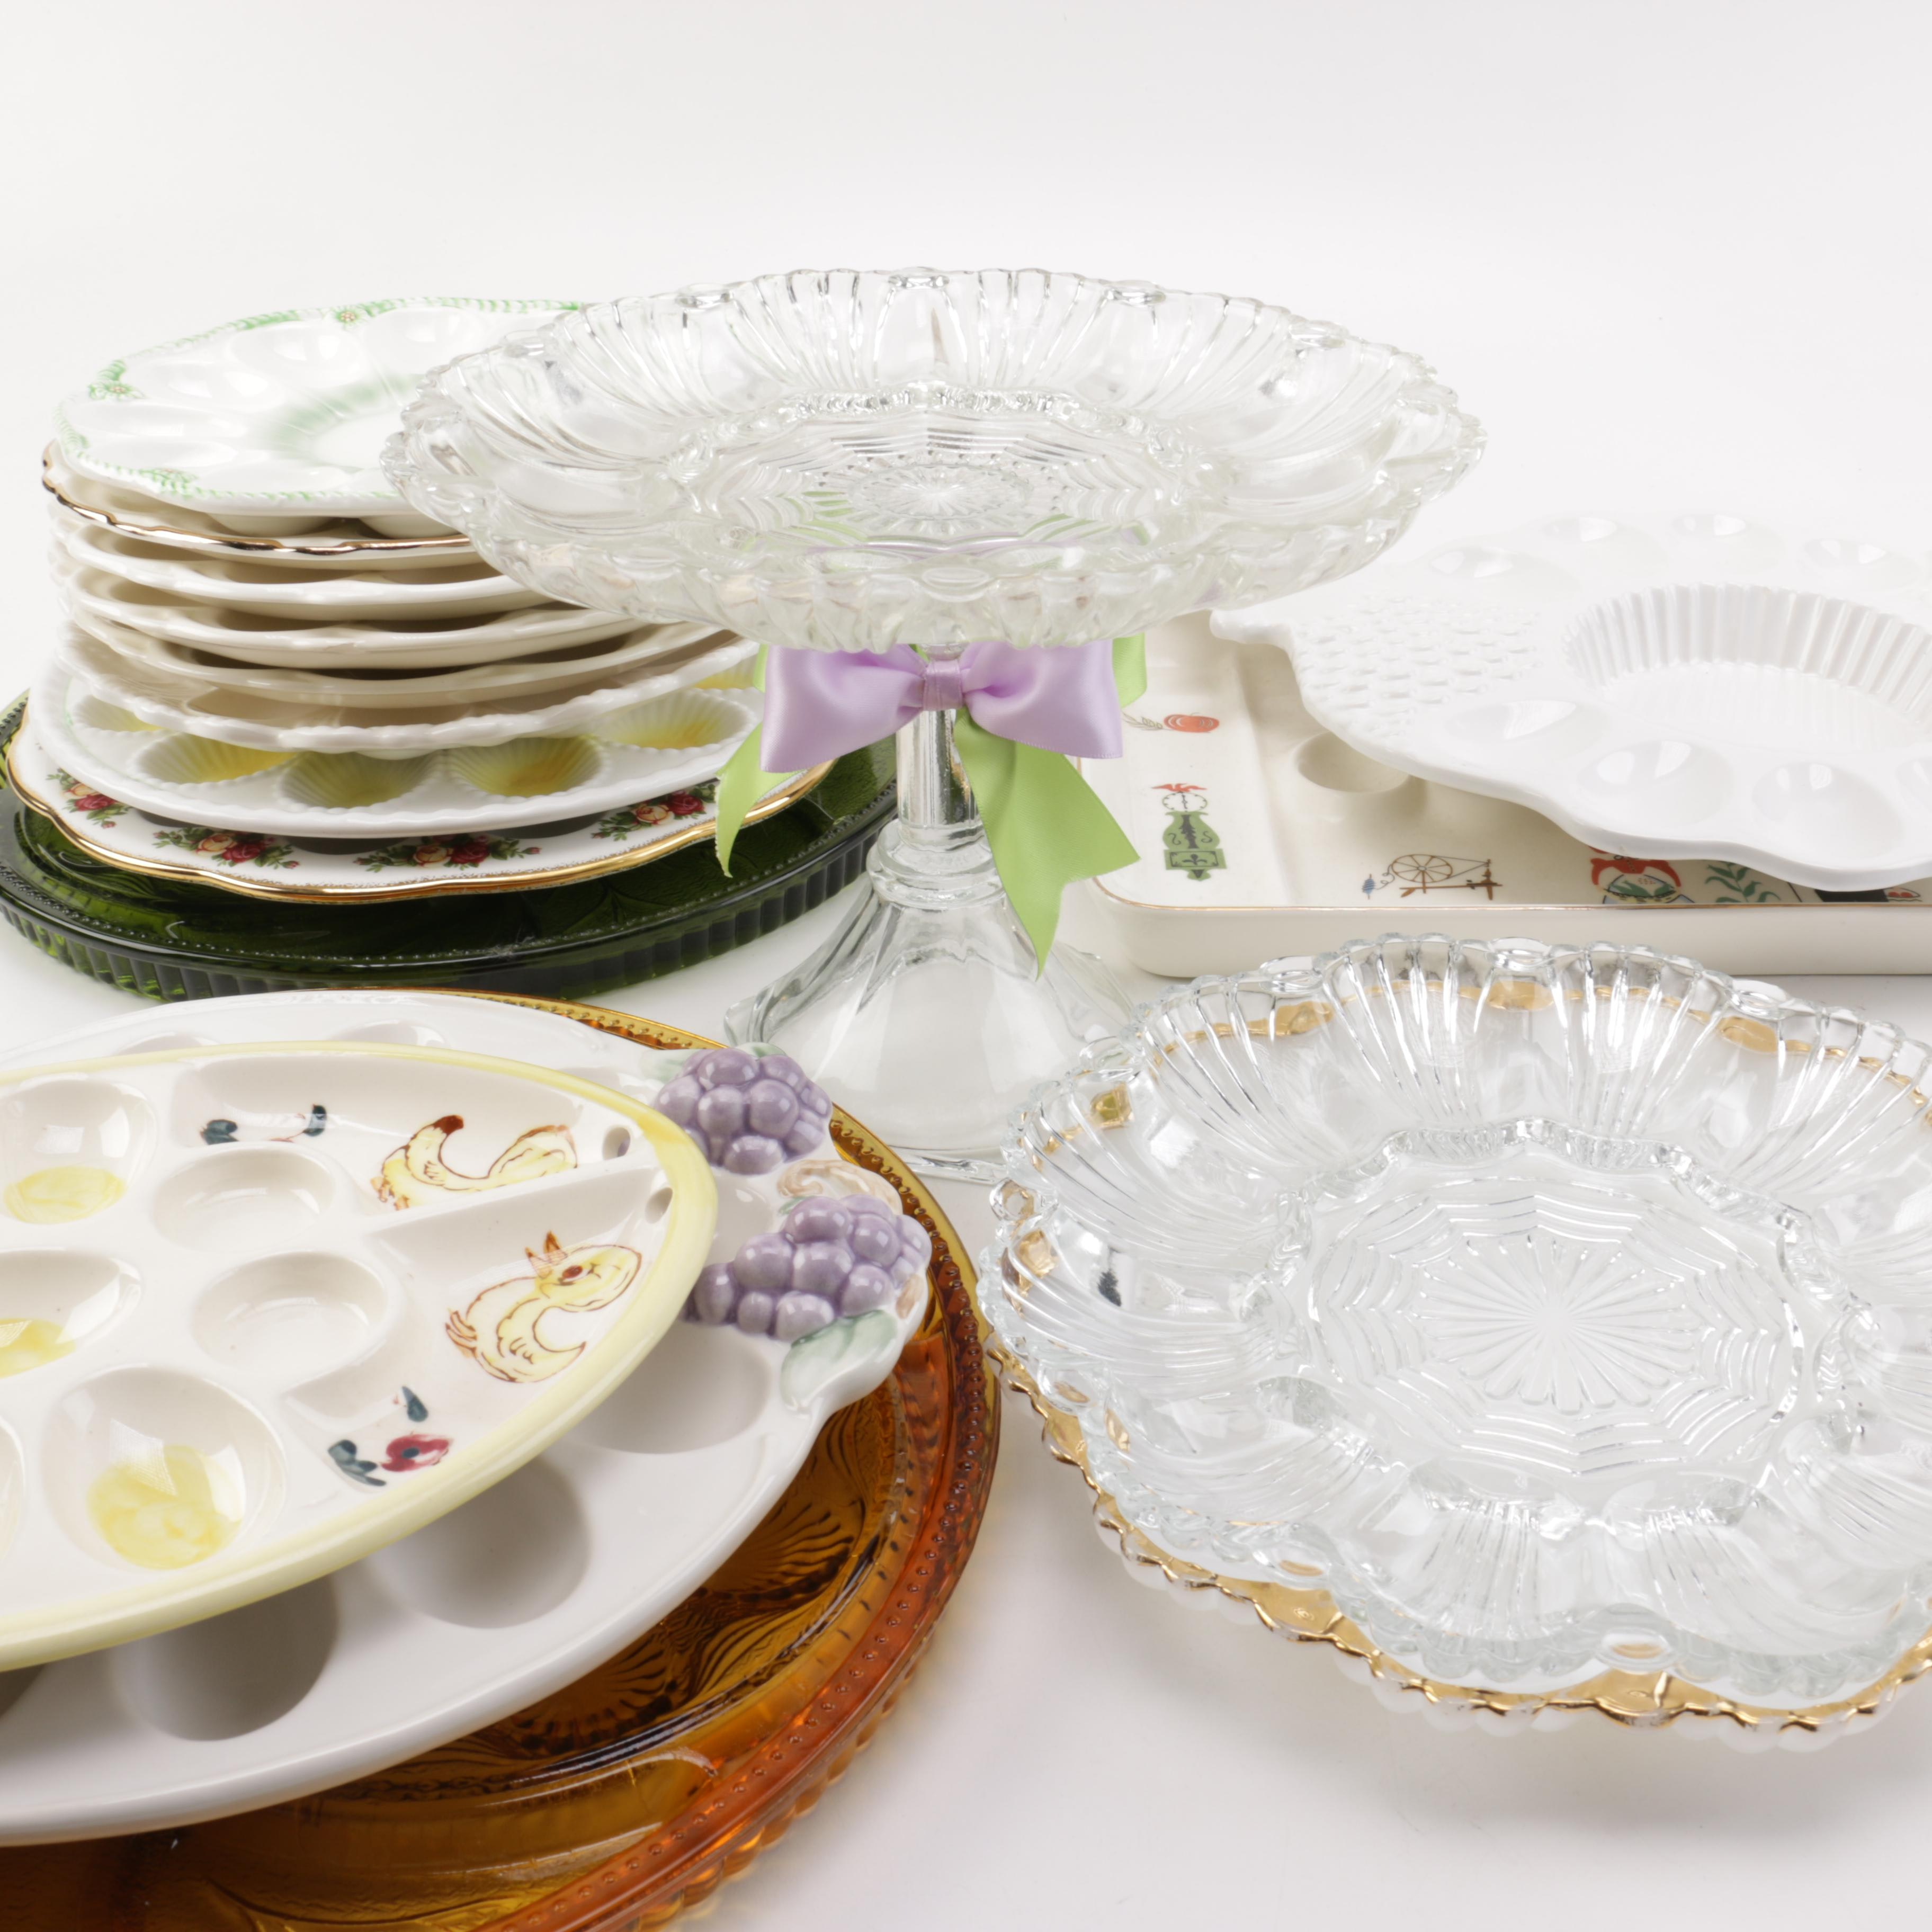 Vintage Deviled Egg Plates and Glass Serving Stand